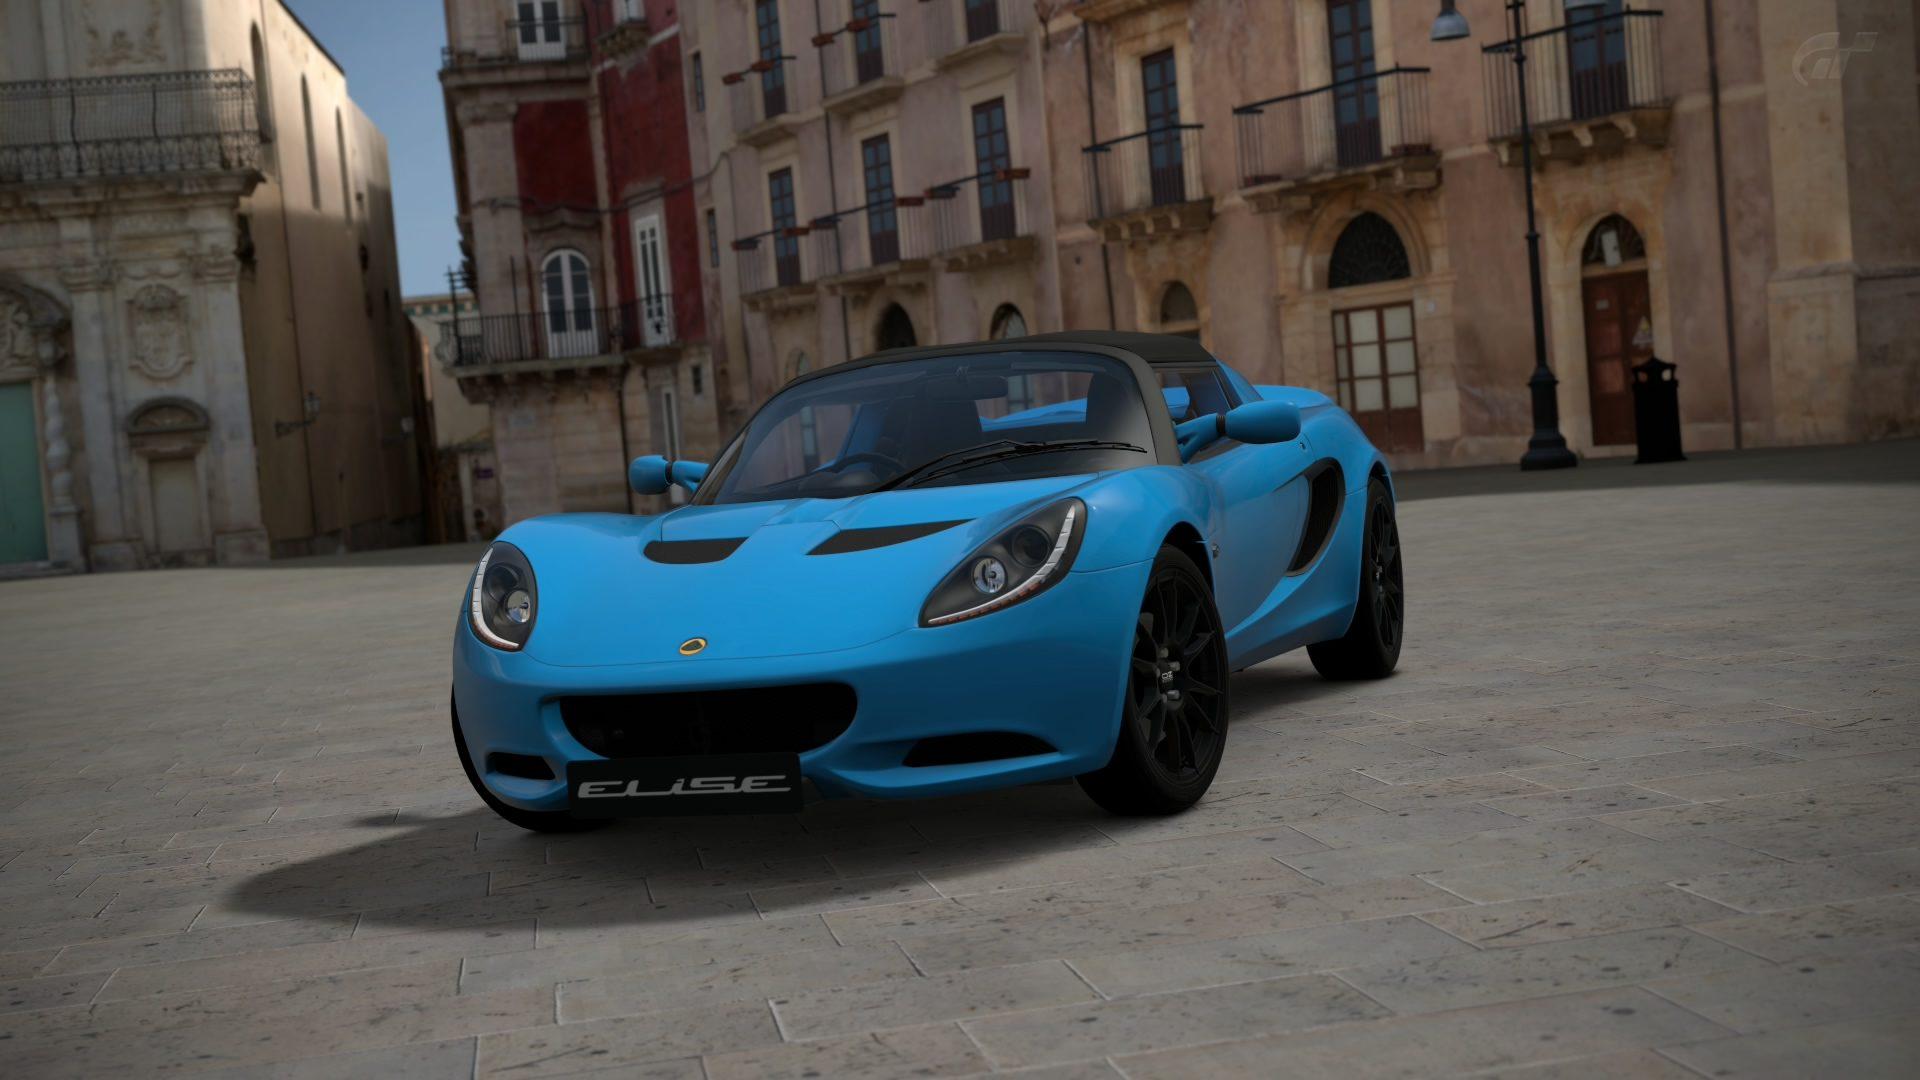 Elise S Club Racer.jpg